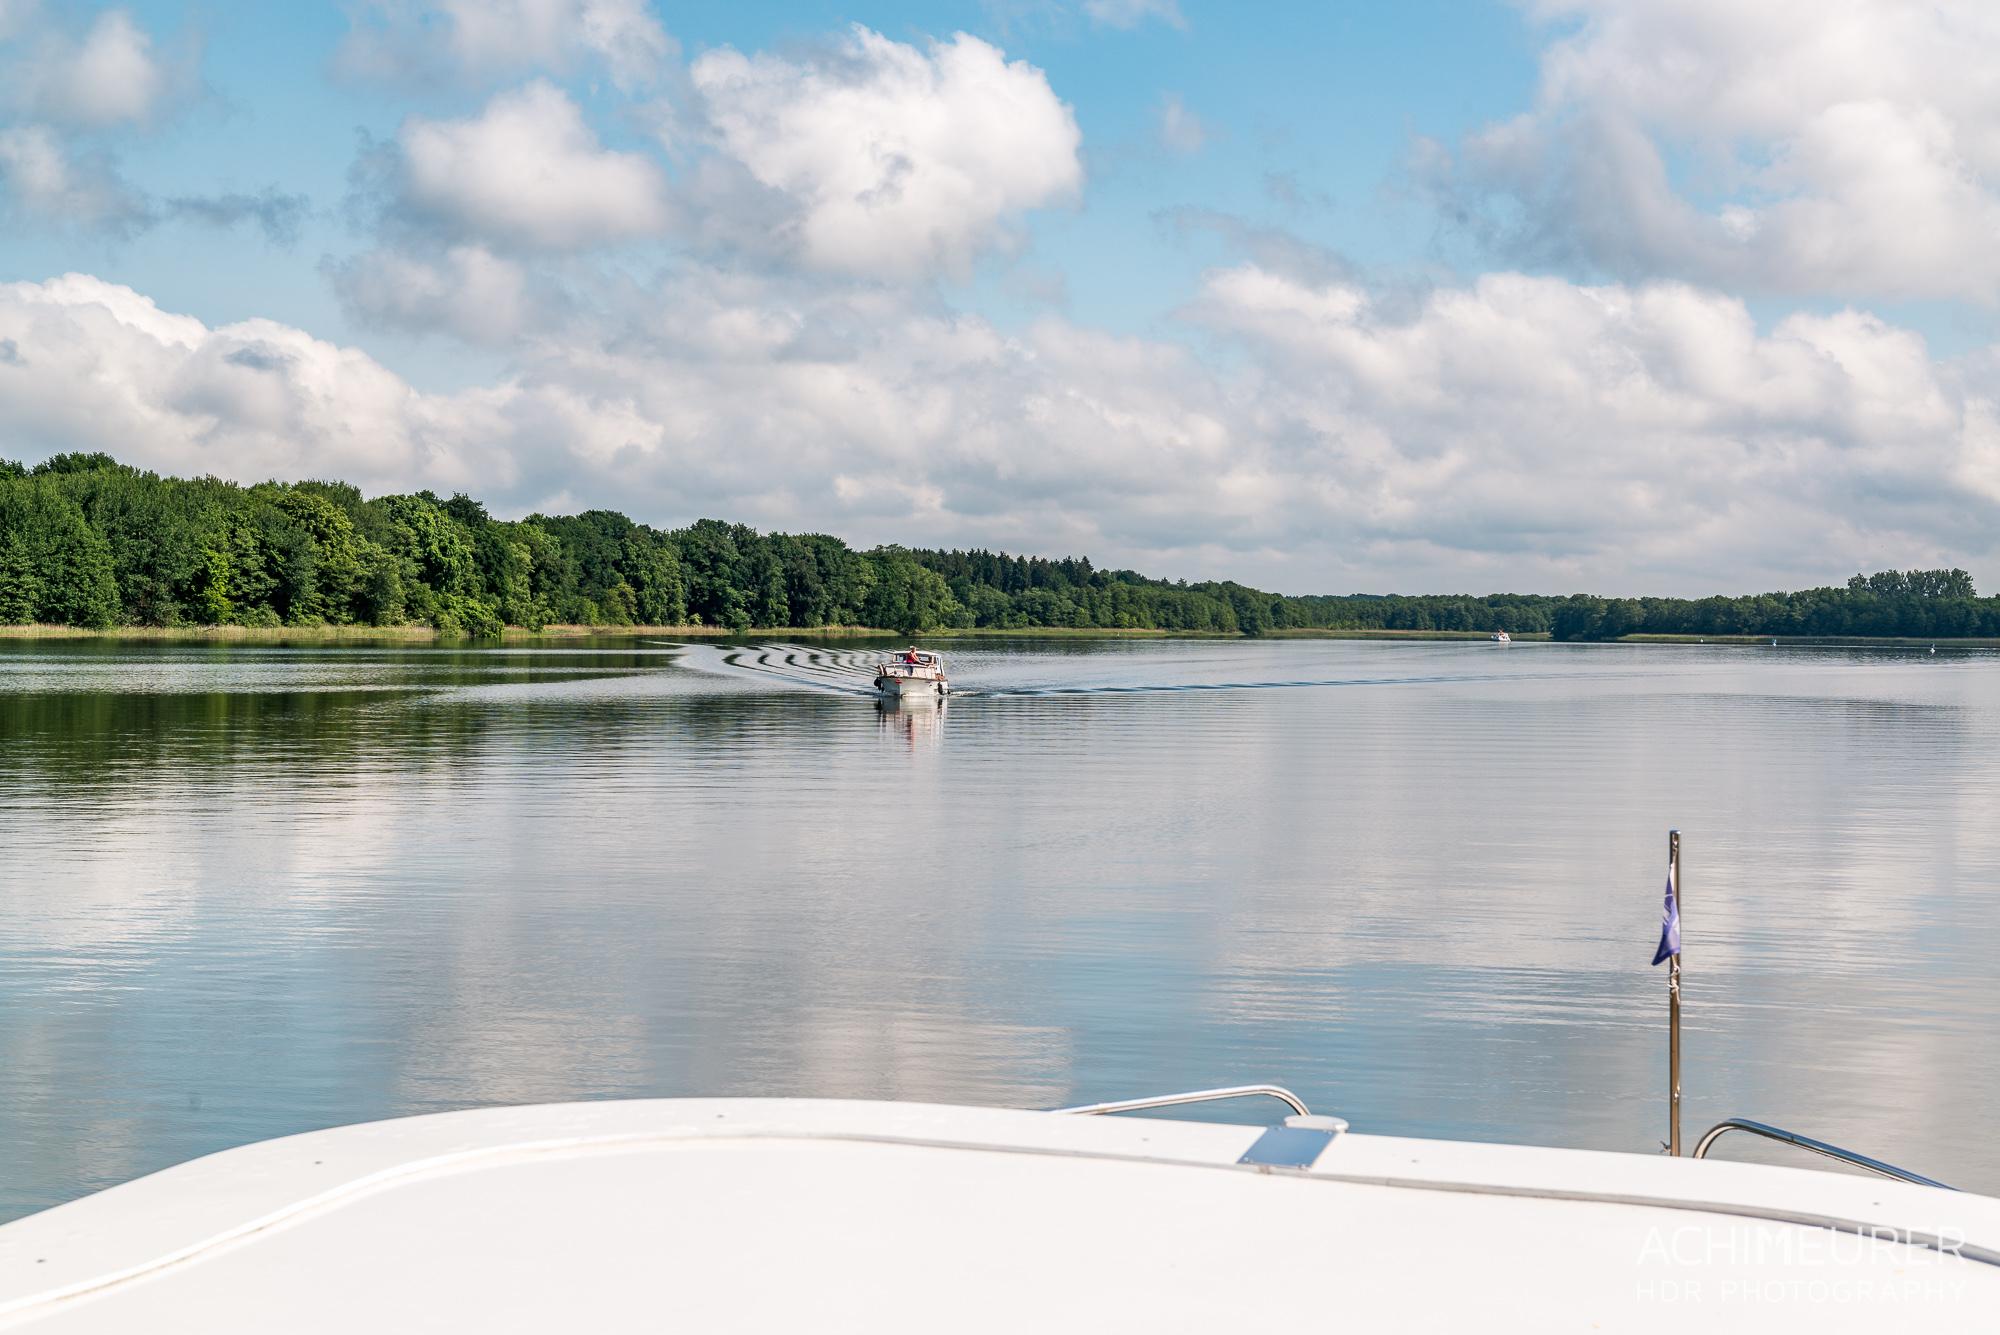 Hausboot-Kuhnle-Mueritz-Mecklenburg-Vorpommern-See_2812